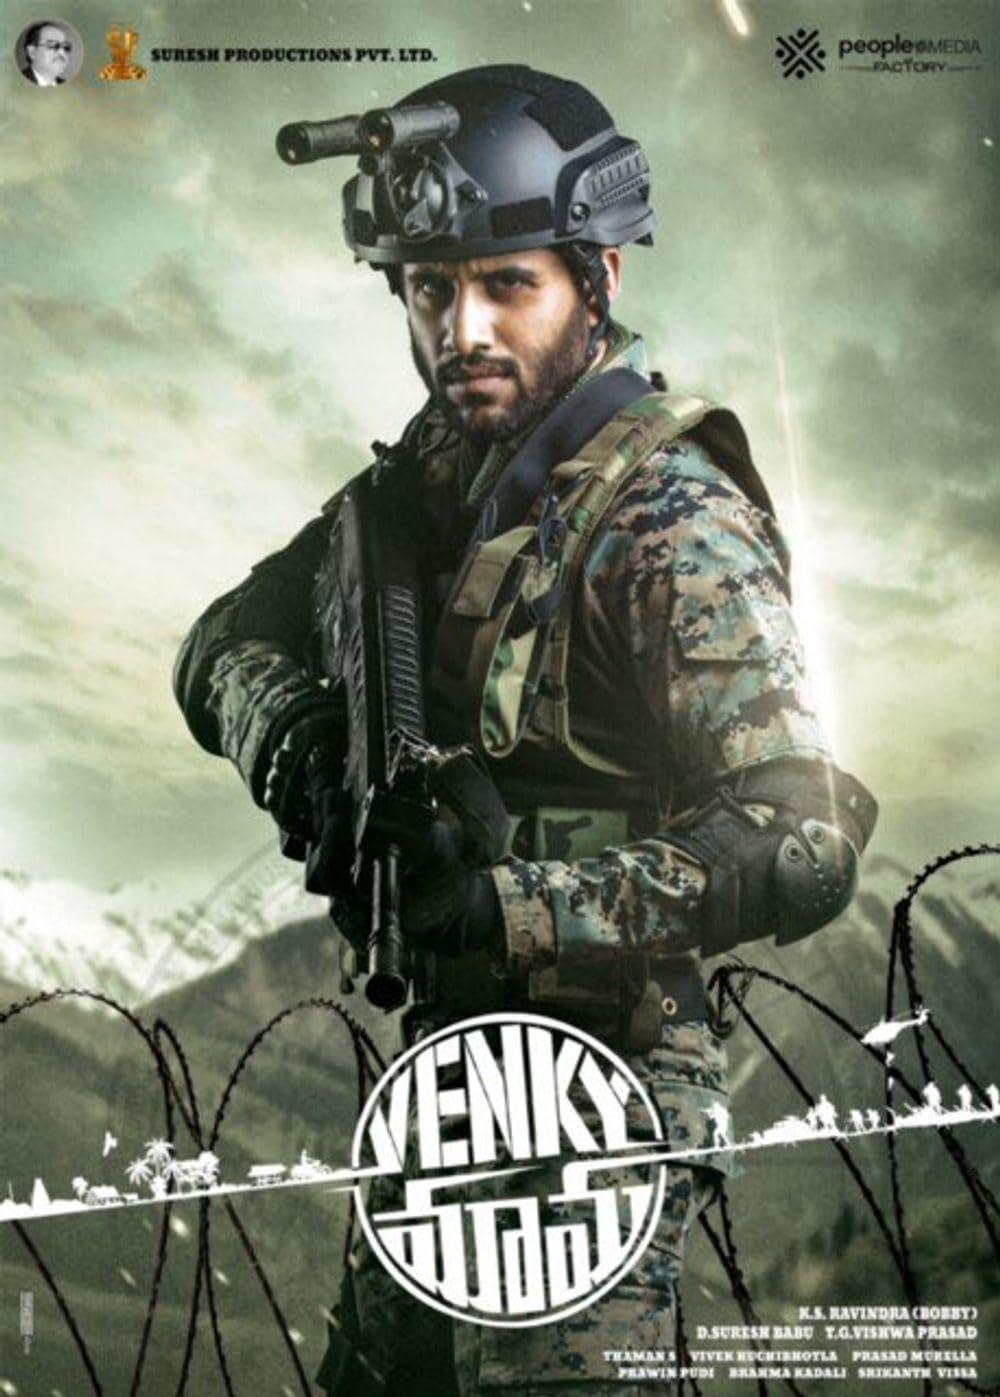 Venky Mama 2021 Hindi Dubbed 720p UNCUT WEB-DL AAC 950MB Download